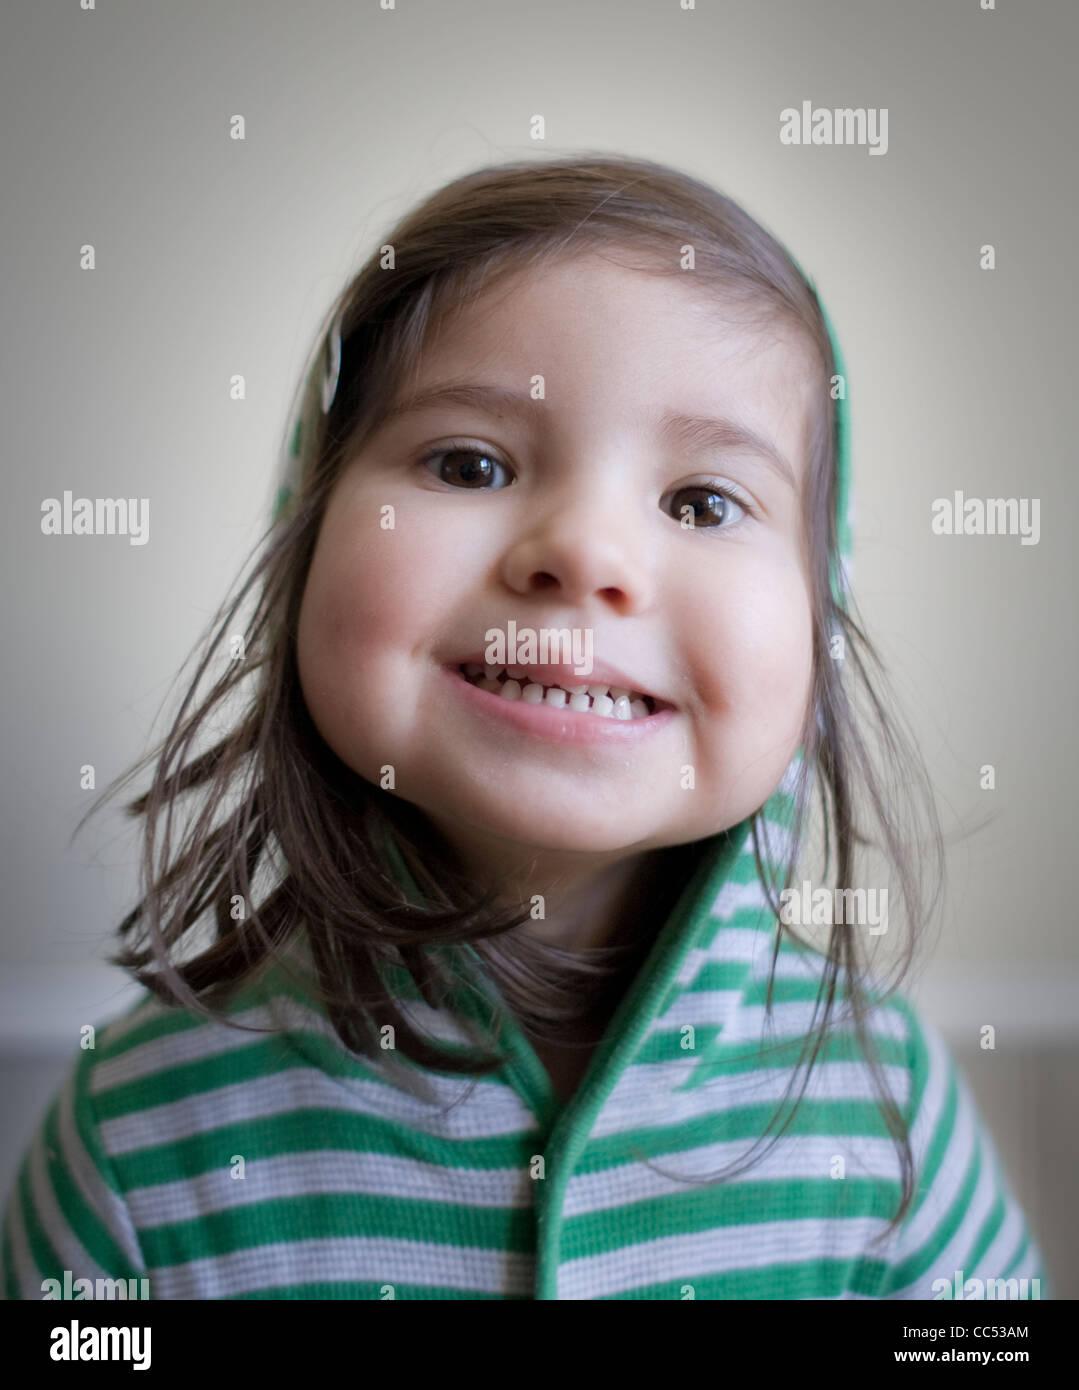 Girl wearing green striped top - Stock Image